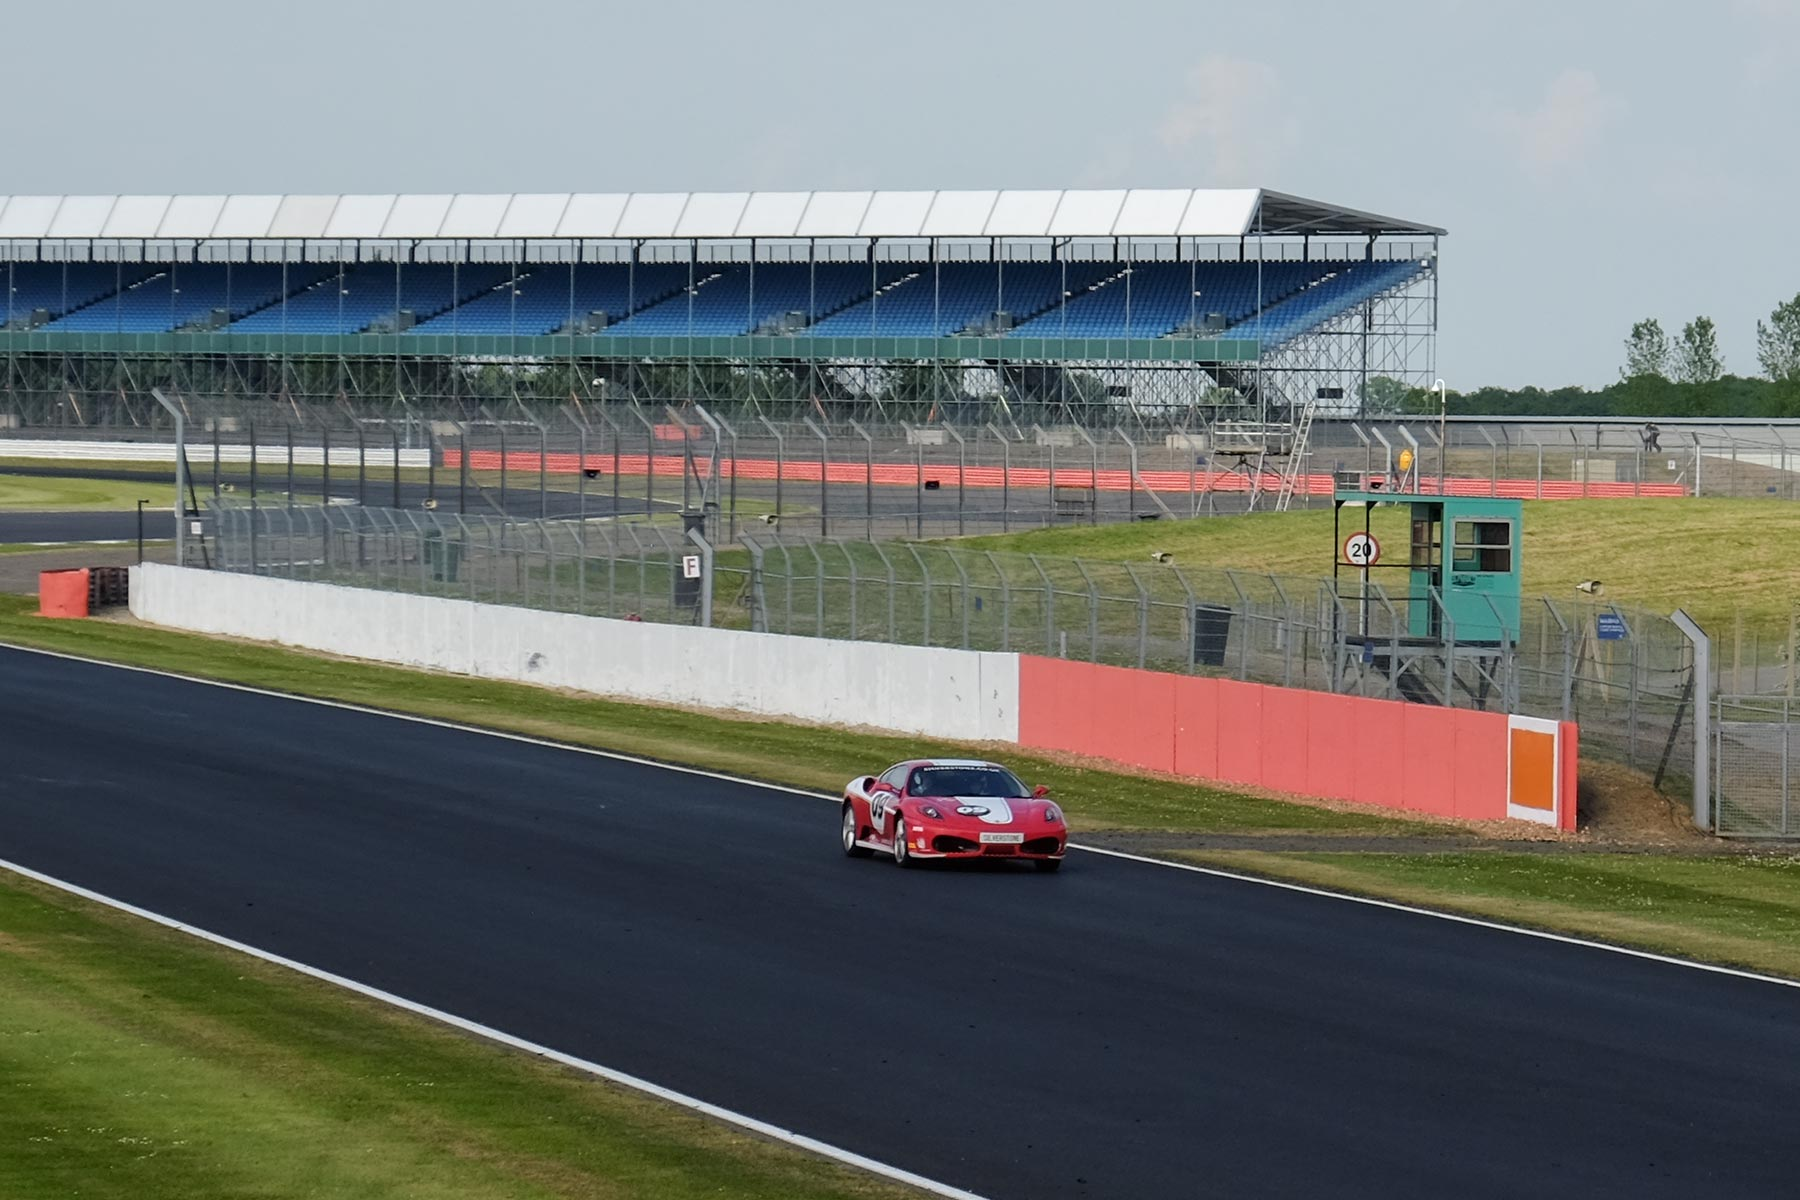 Ferrari F430 Experience in Silverstone